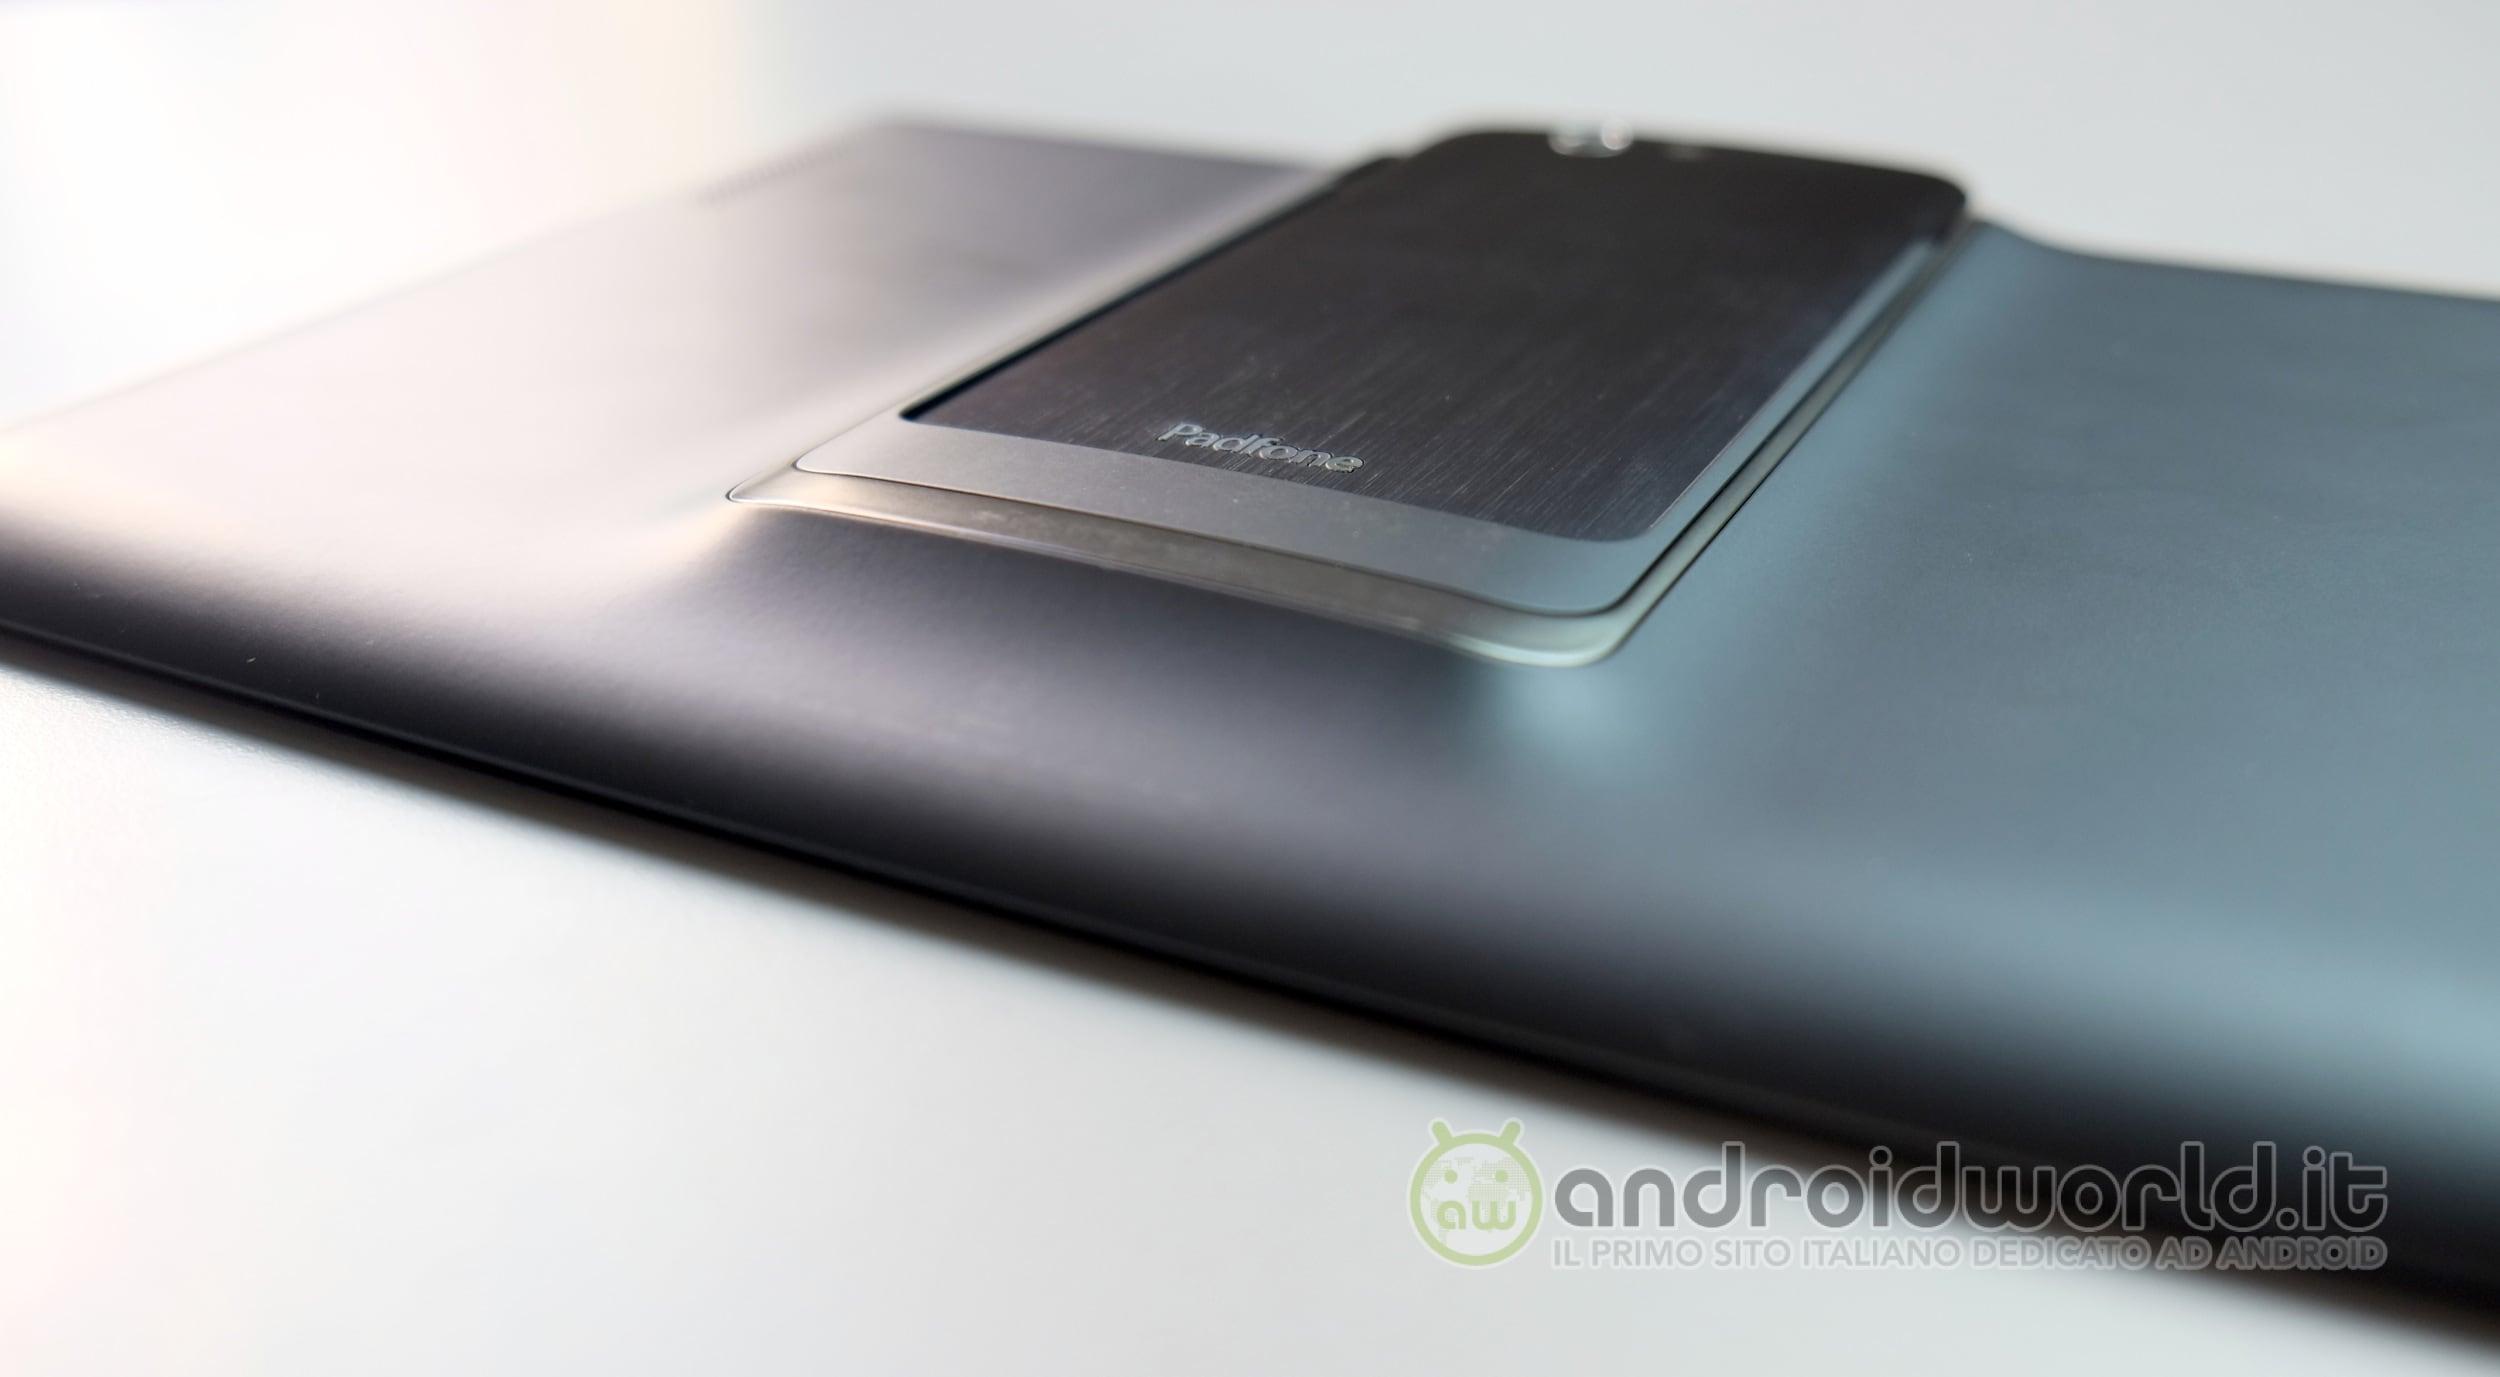 Asus The New Padfone A86 Il Nostro Unboxing Foto E Video